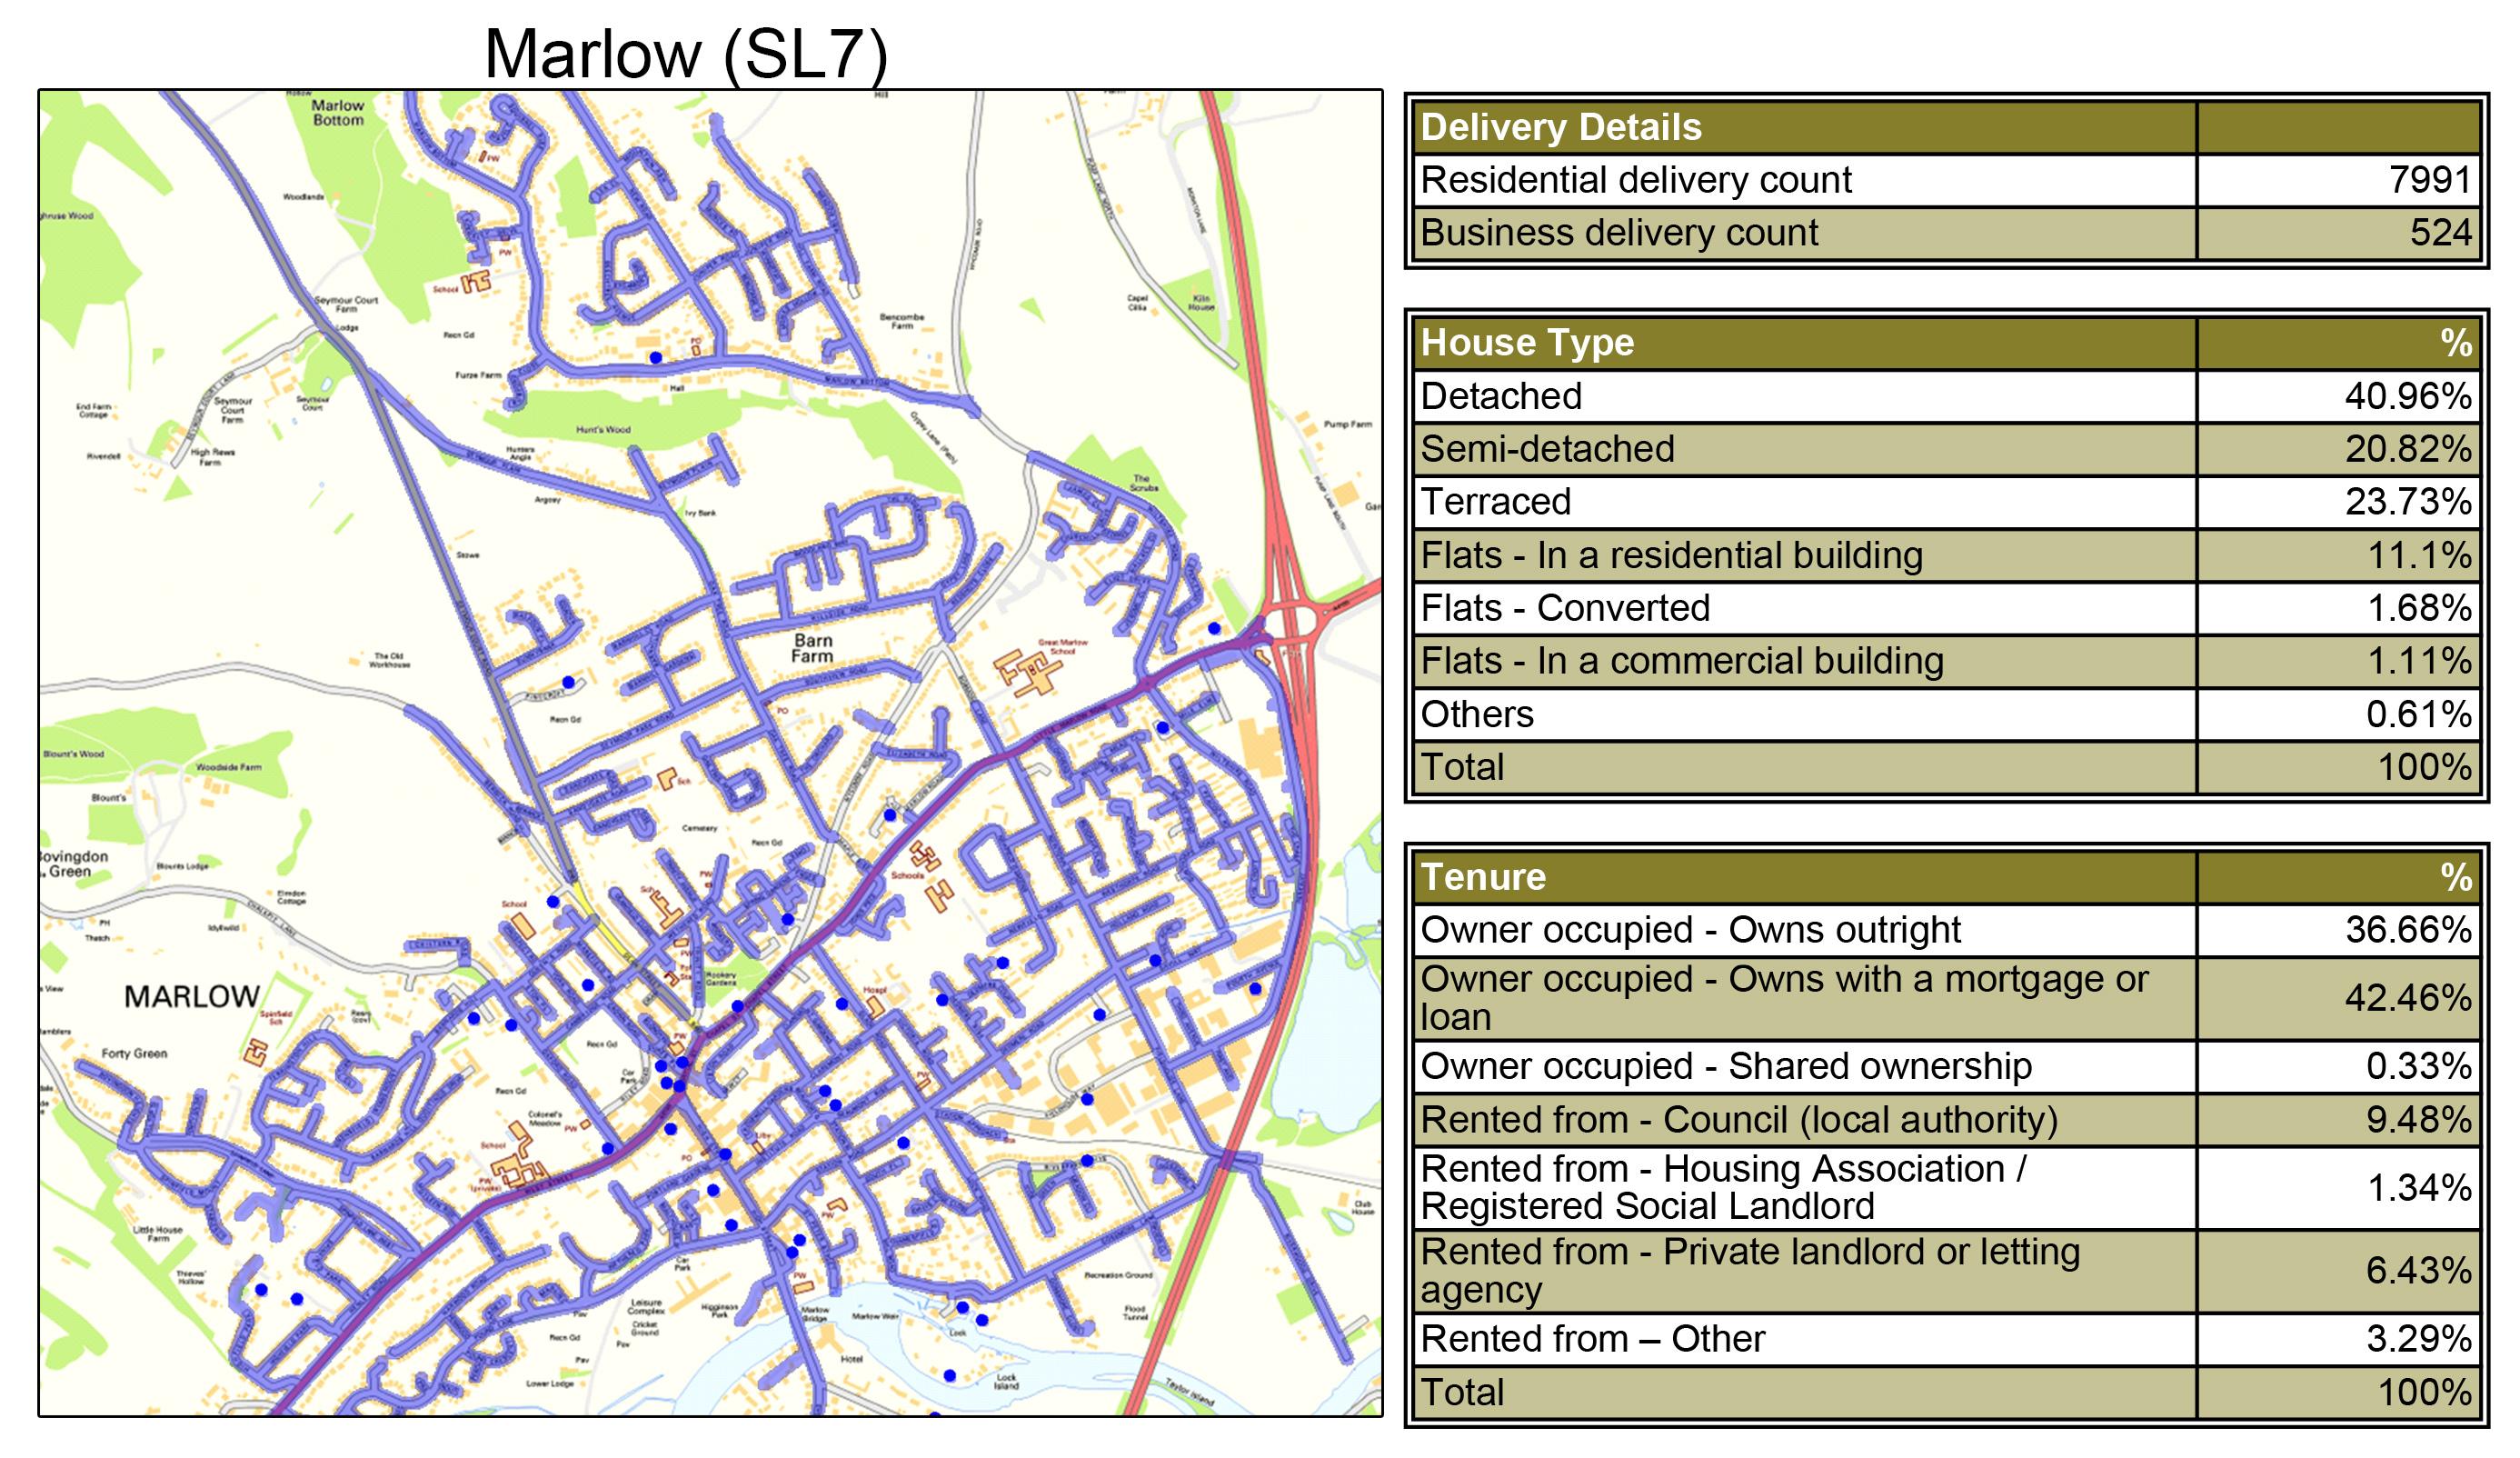 Leaflet Distribution Marlow - Geoplan Image